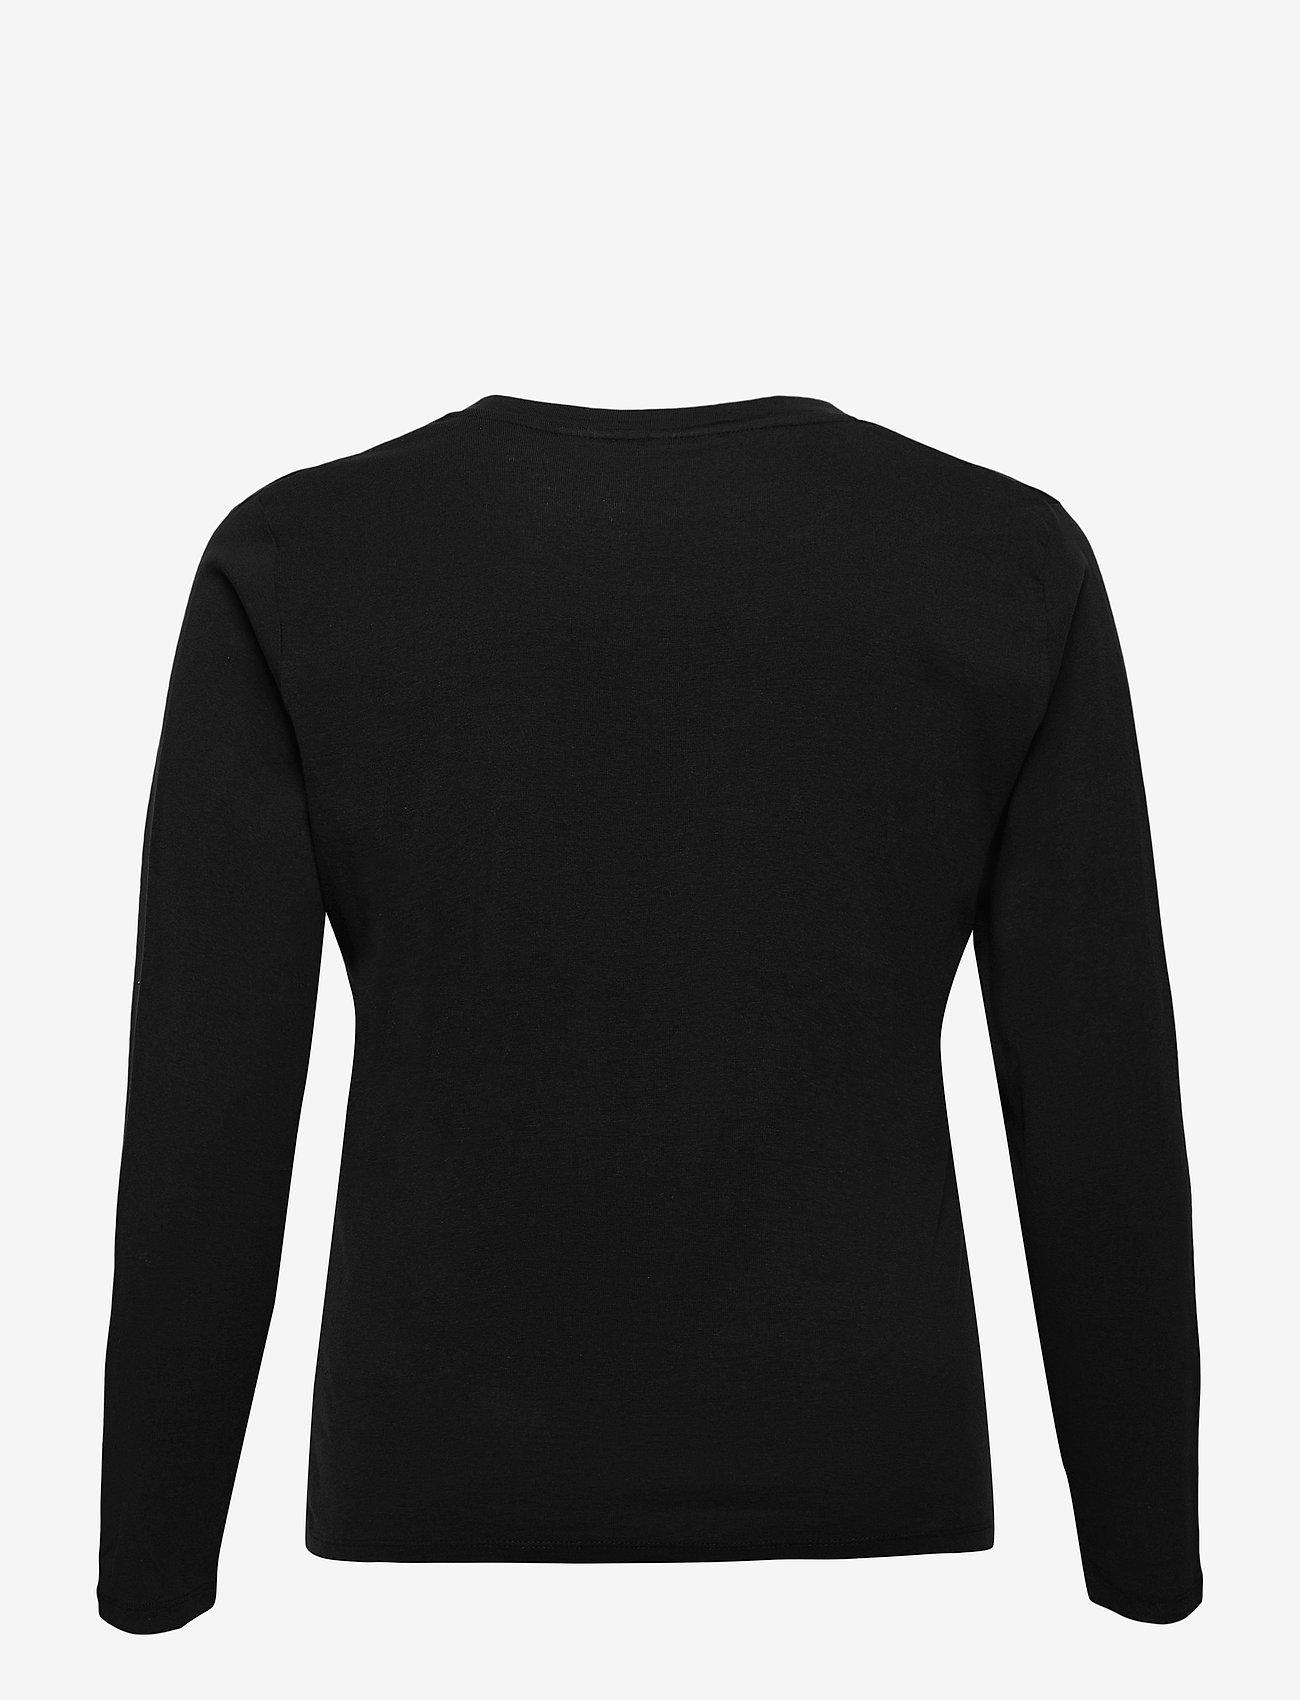 Levi's Plus Size - PL LONG SLEEVE BABY TEE CAVIAR - tops met lange mouwen - blacks - 1